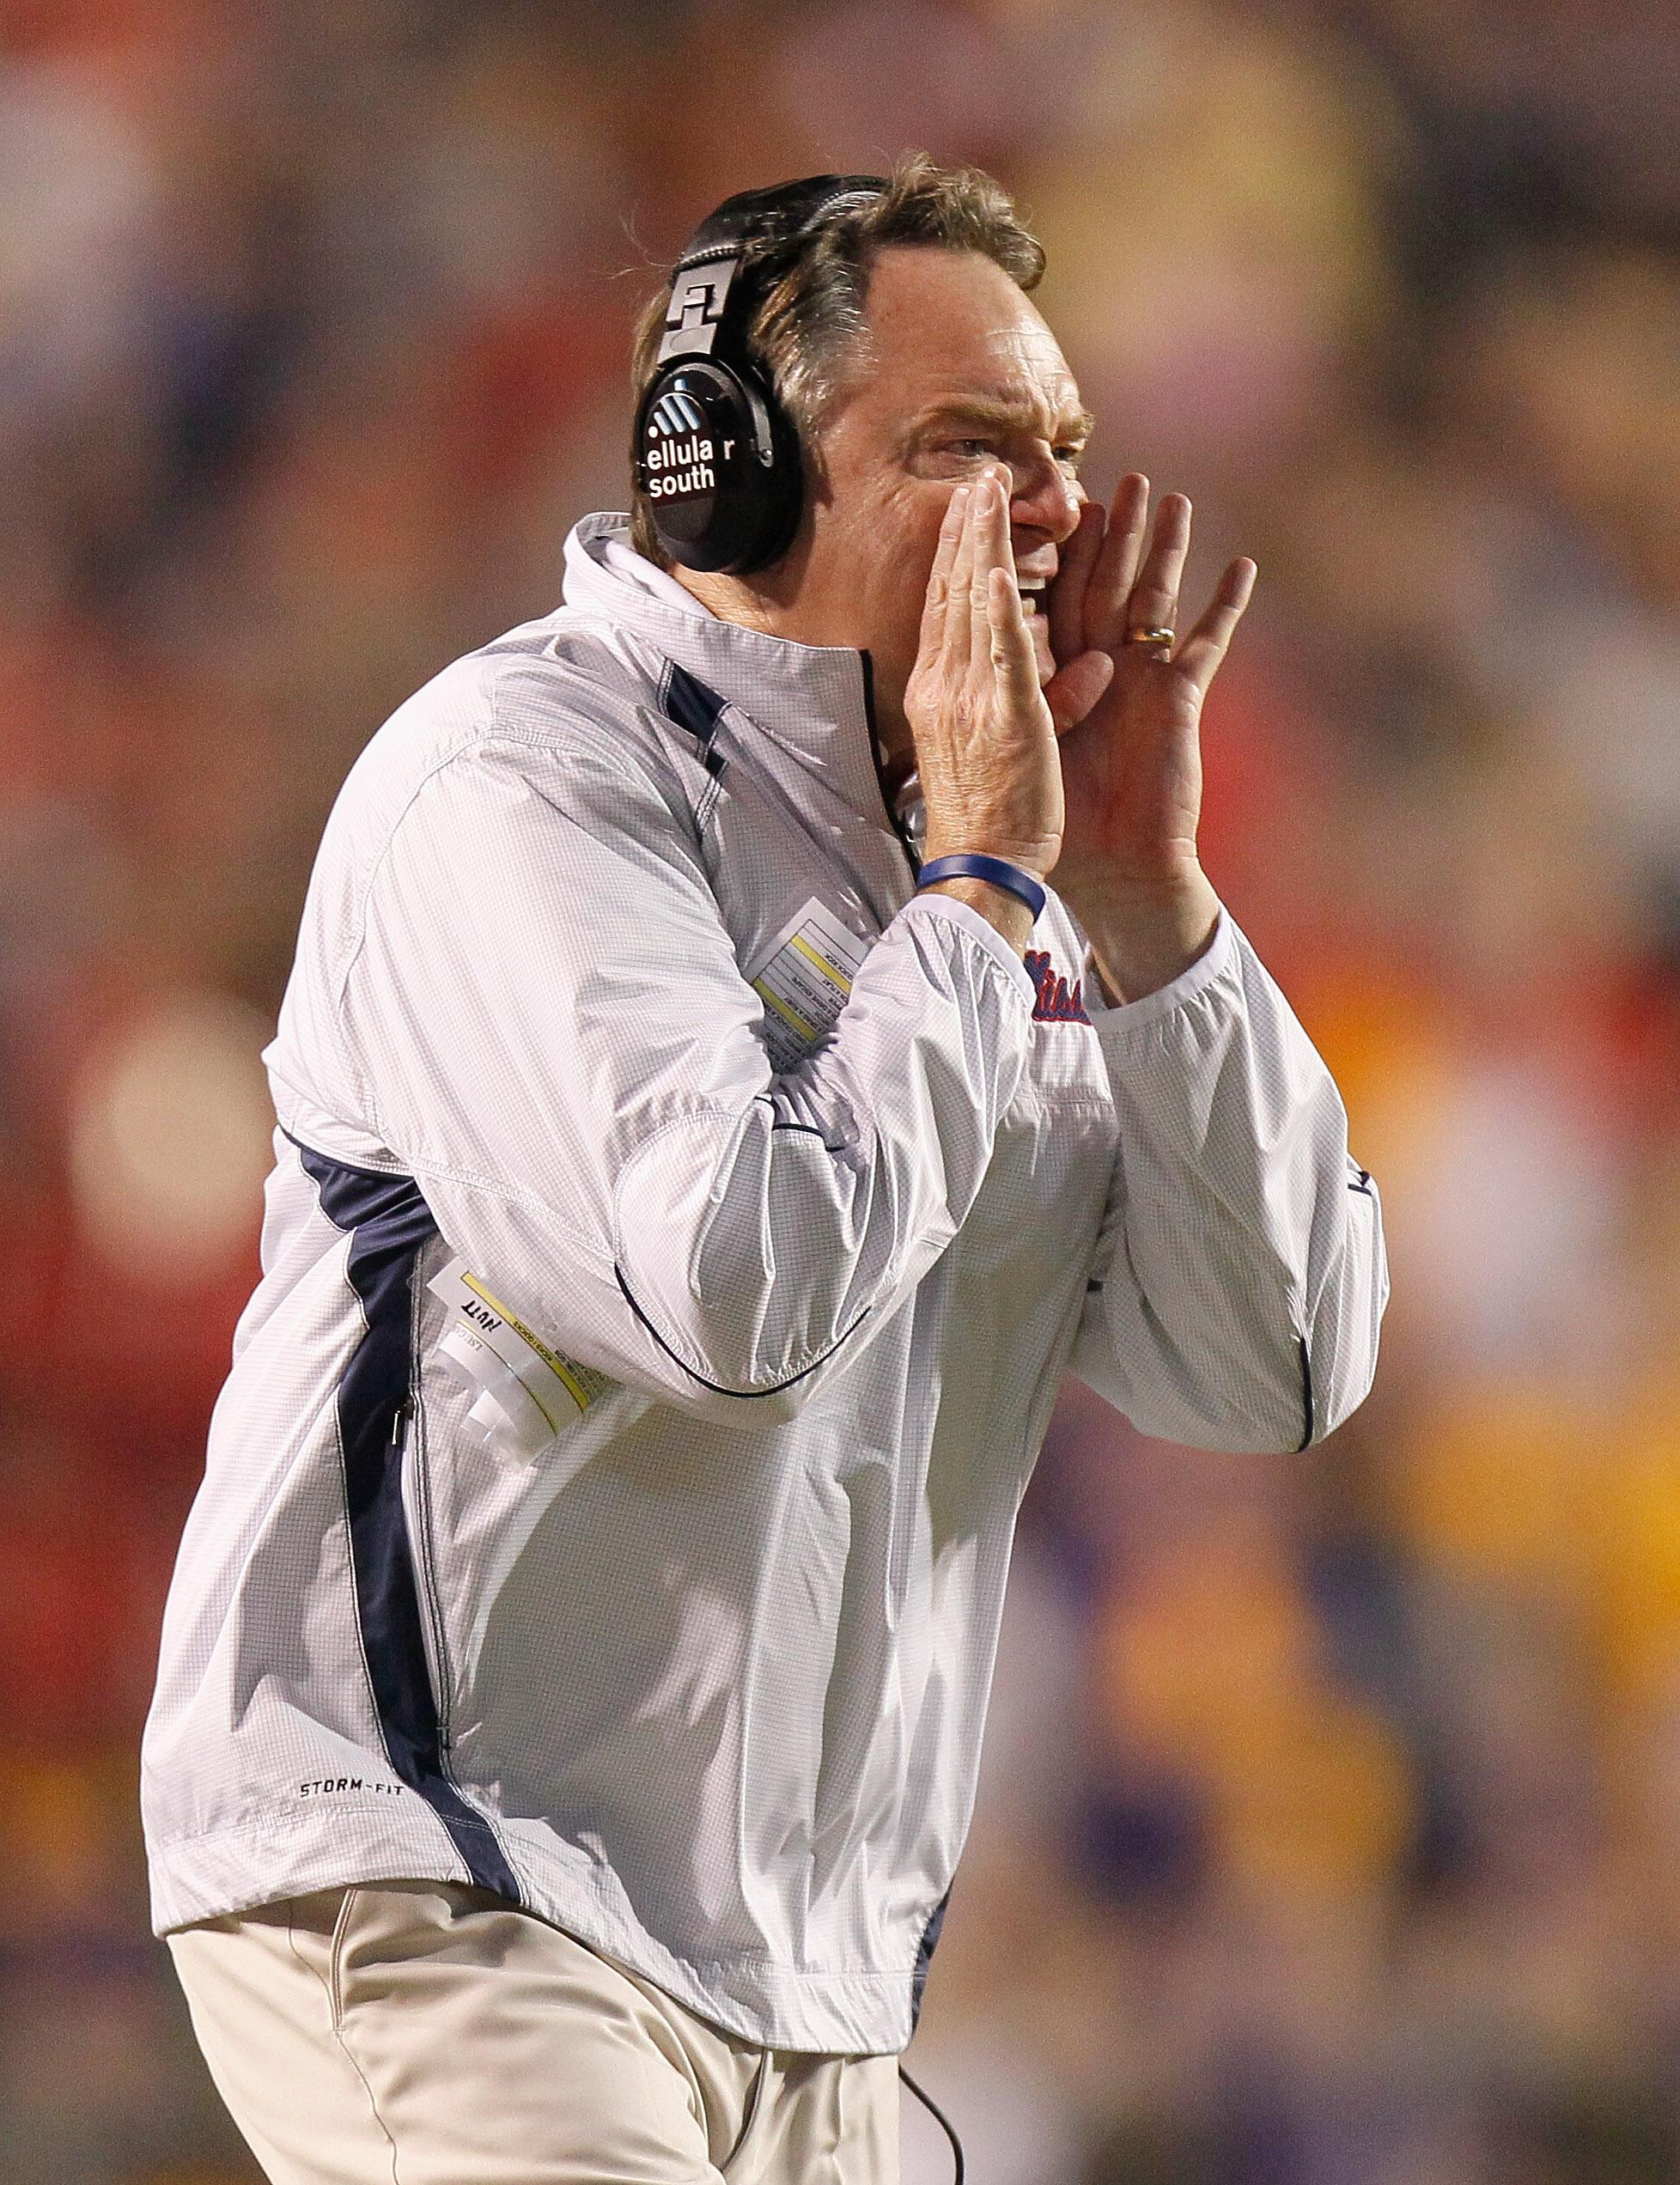 Houston Nutt still has to decide between three quarterback options.